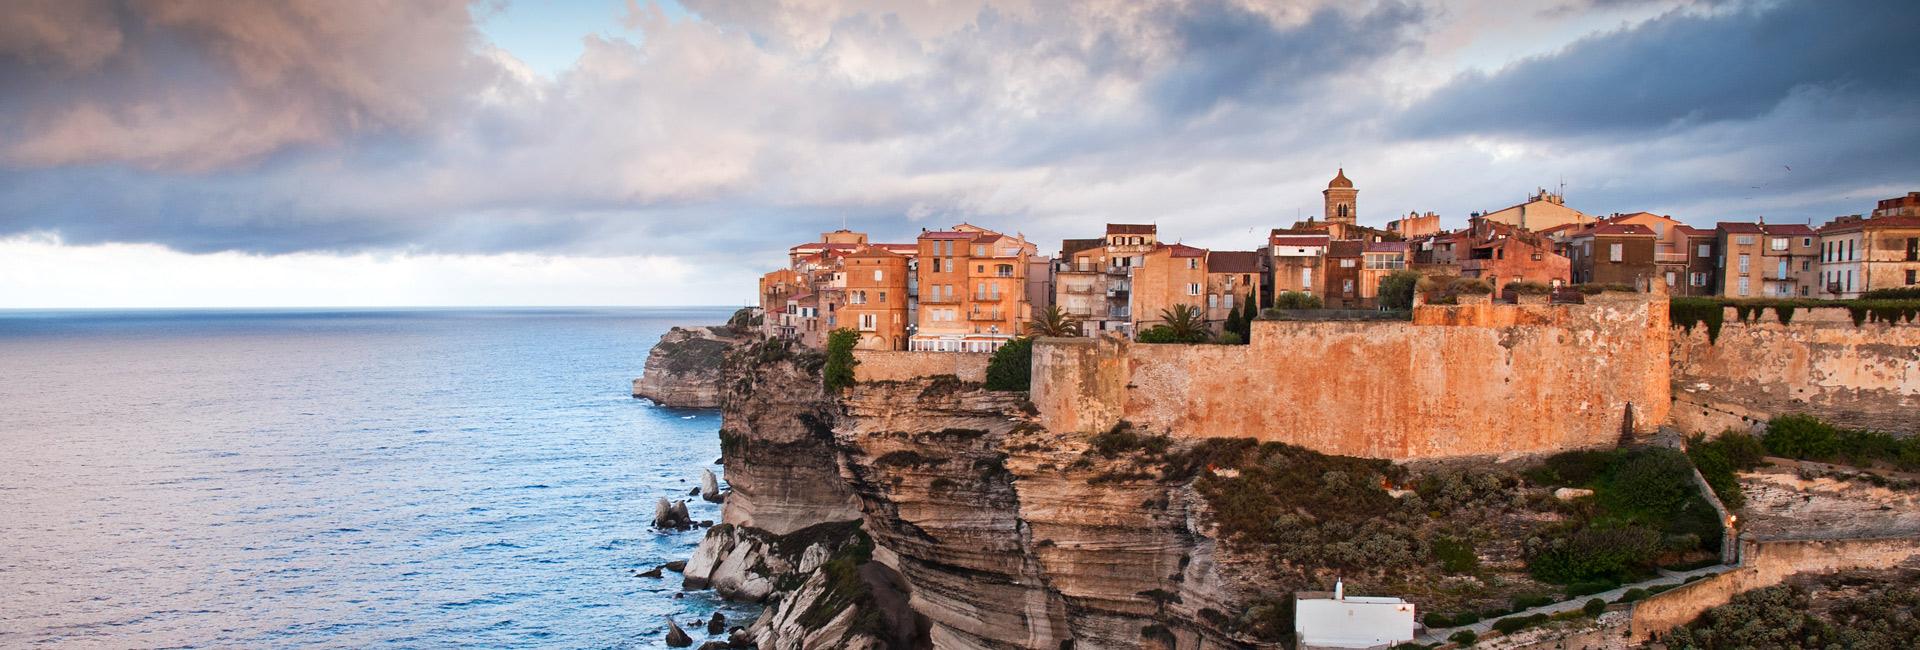 Corsica-e-Sardegna_iStock_000022385026_Large